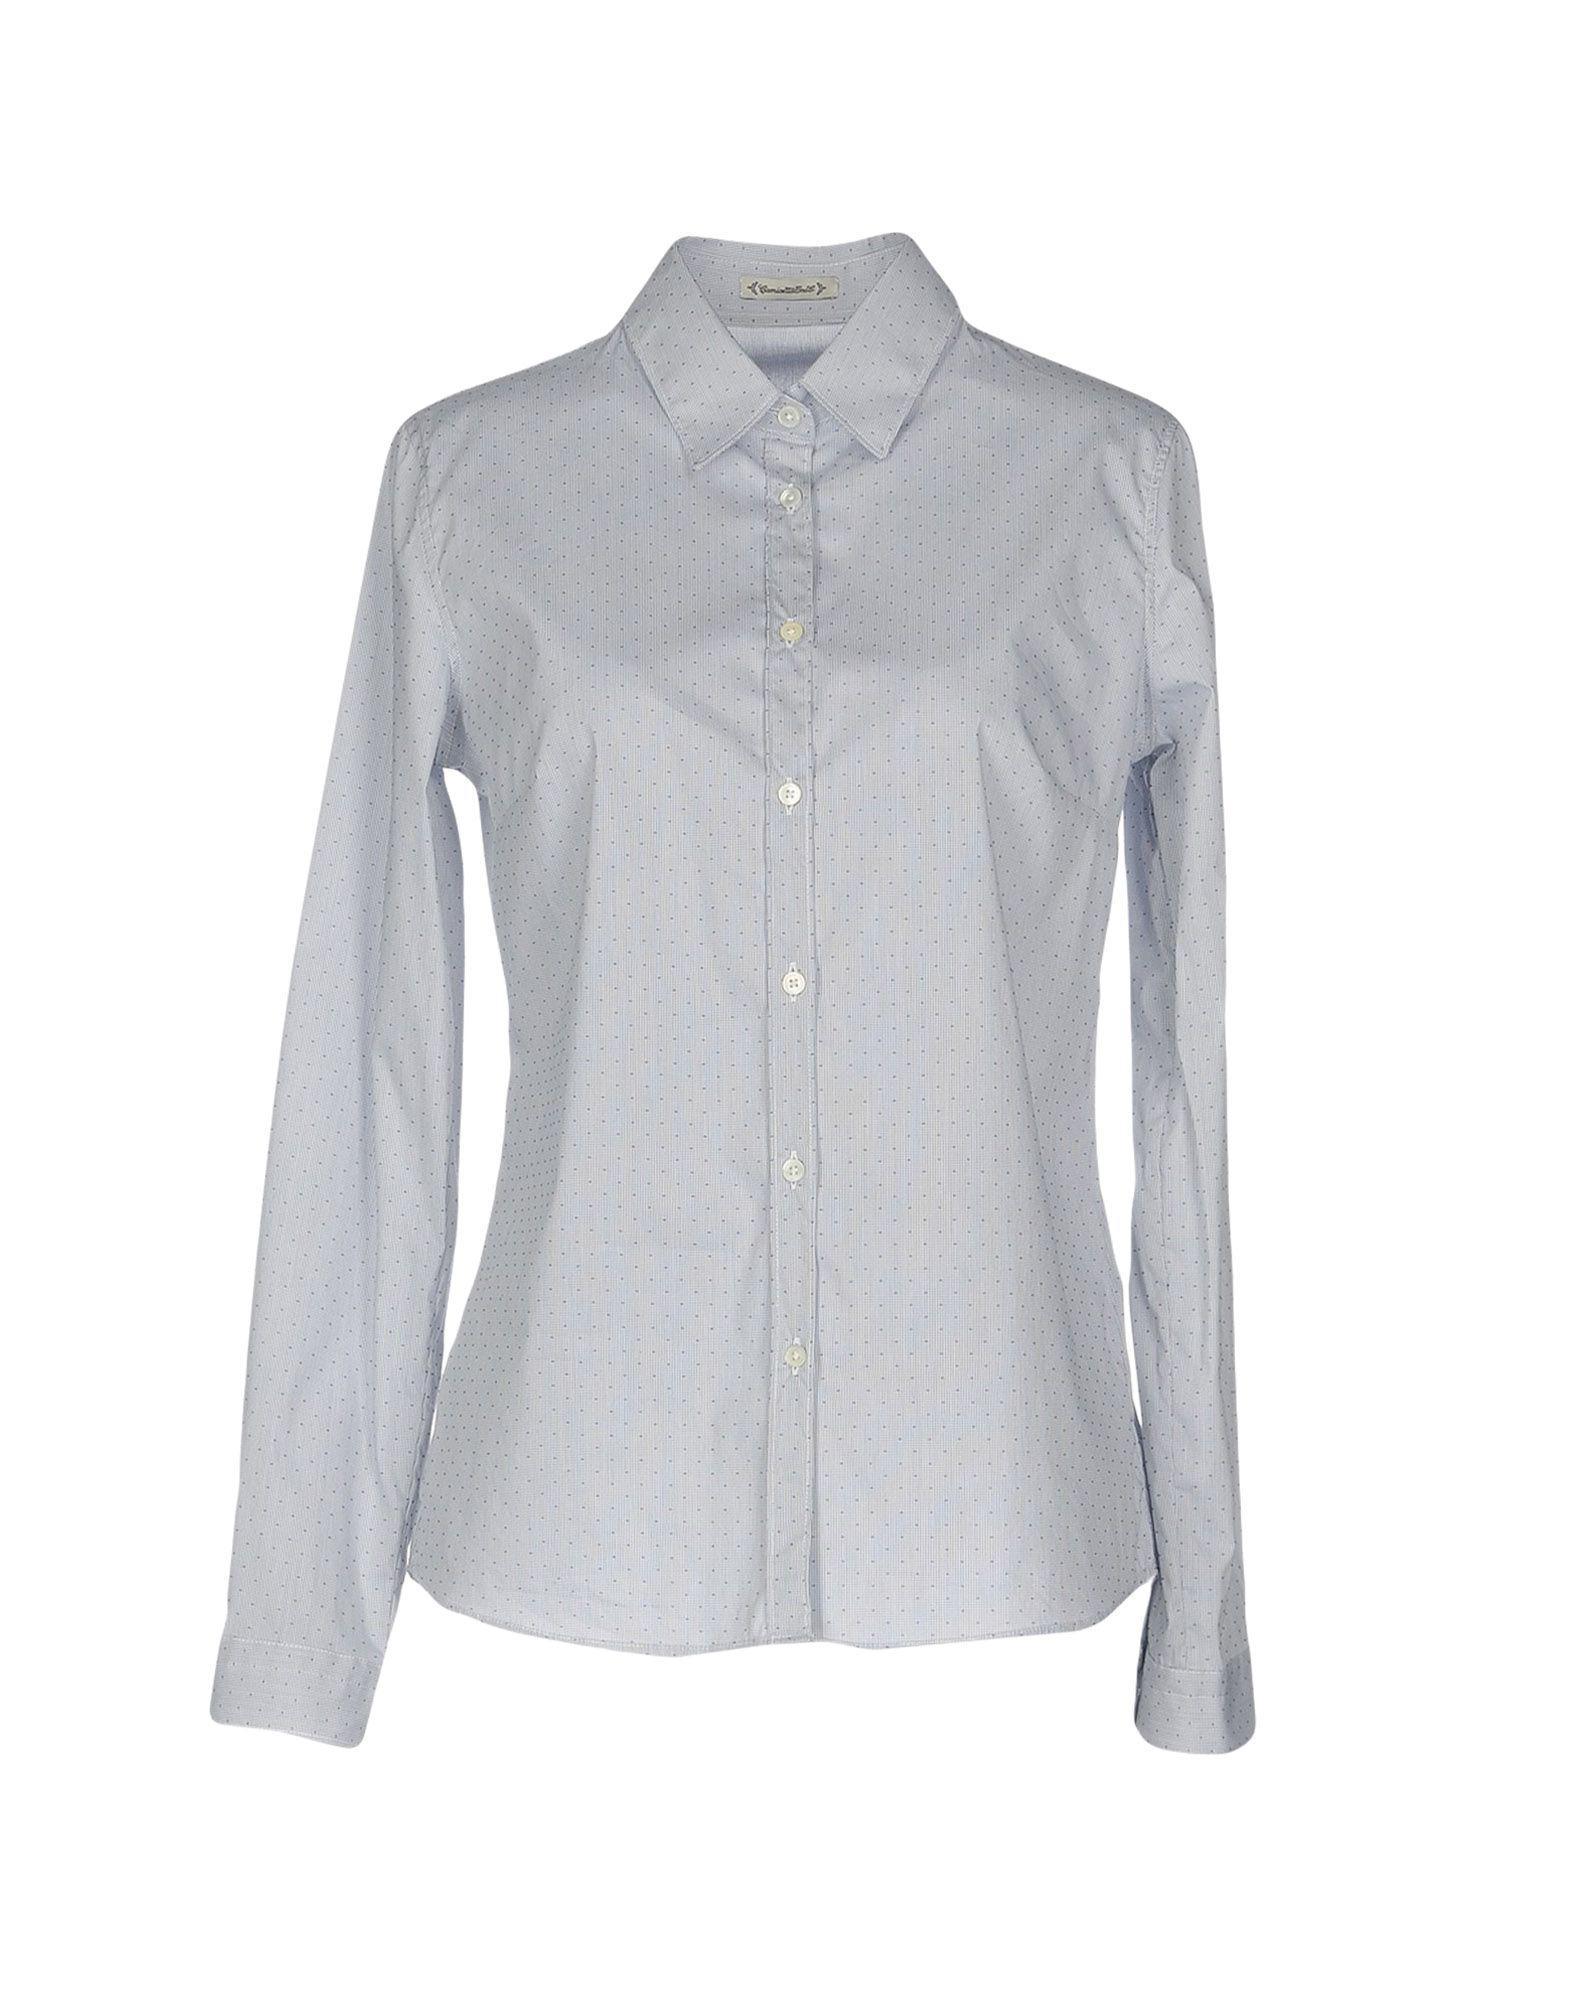 SHIRTS - Shirts Camicettasnob Find Great m6WvubF